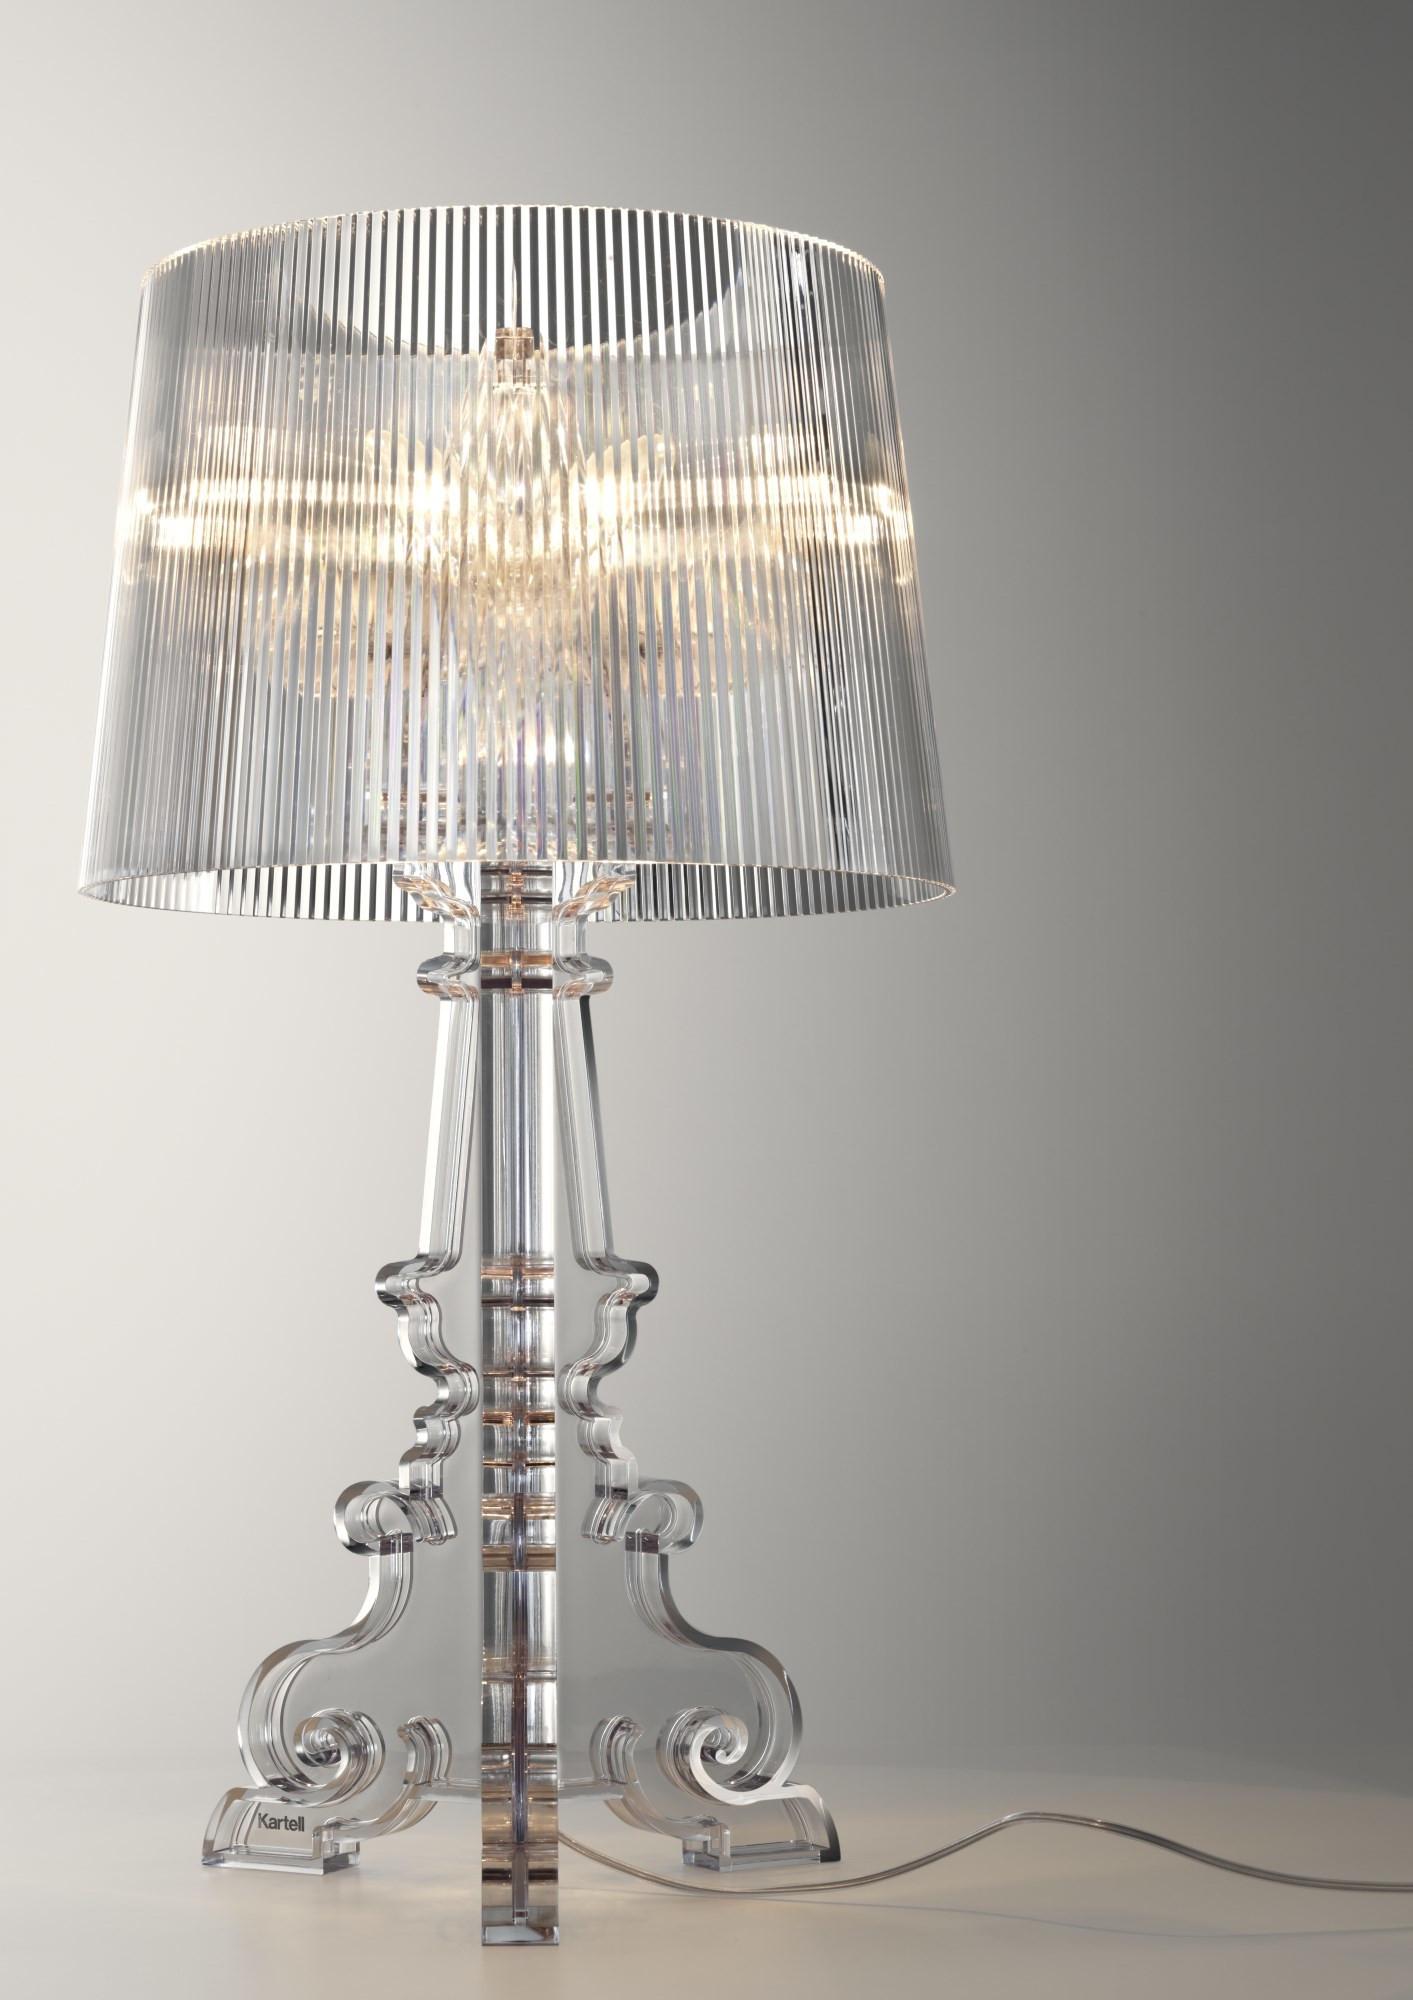 Kartell 9070b4 Lampe De Table Bourgie Cristal Design Philippe Starck